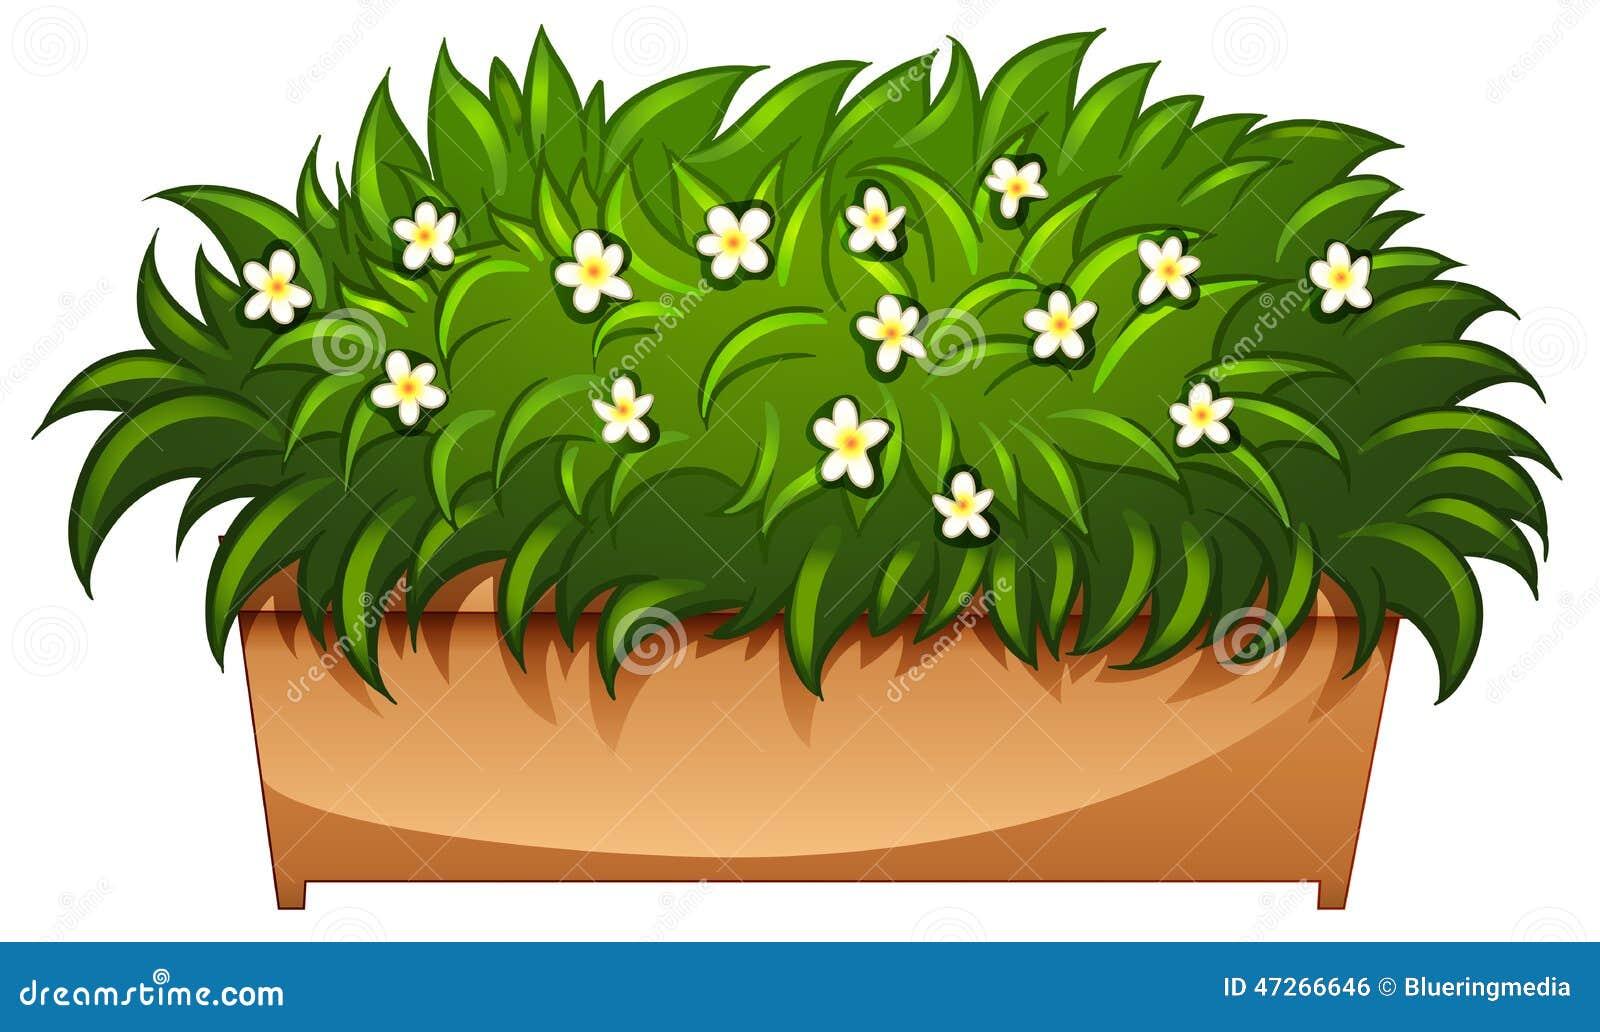 A flowering houseplant